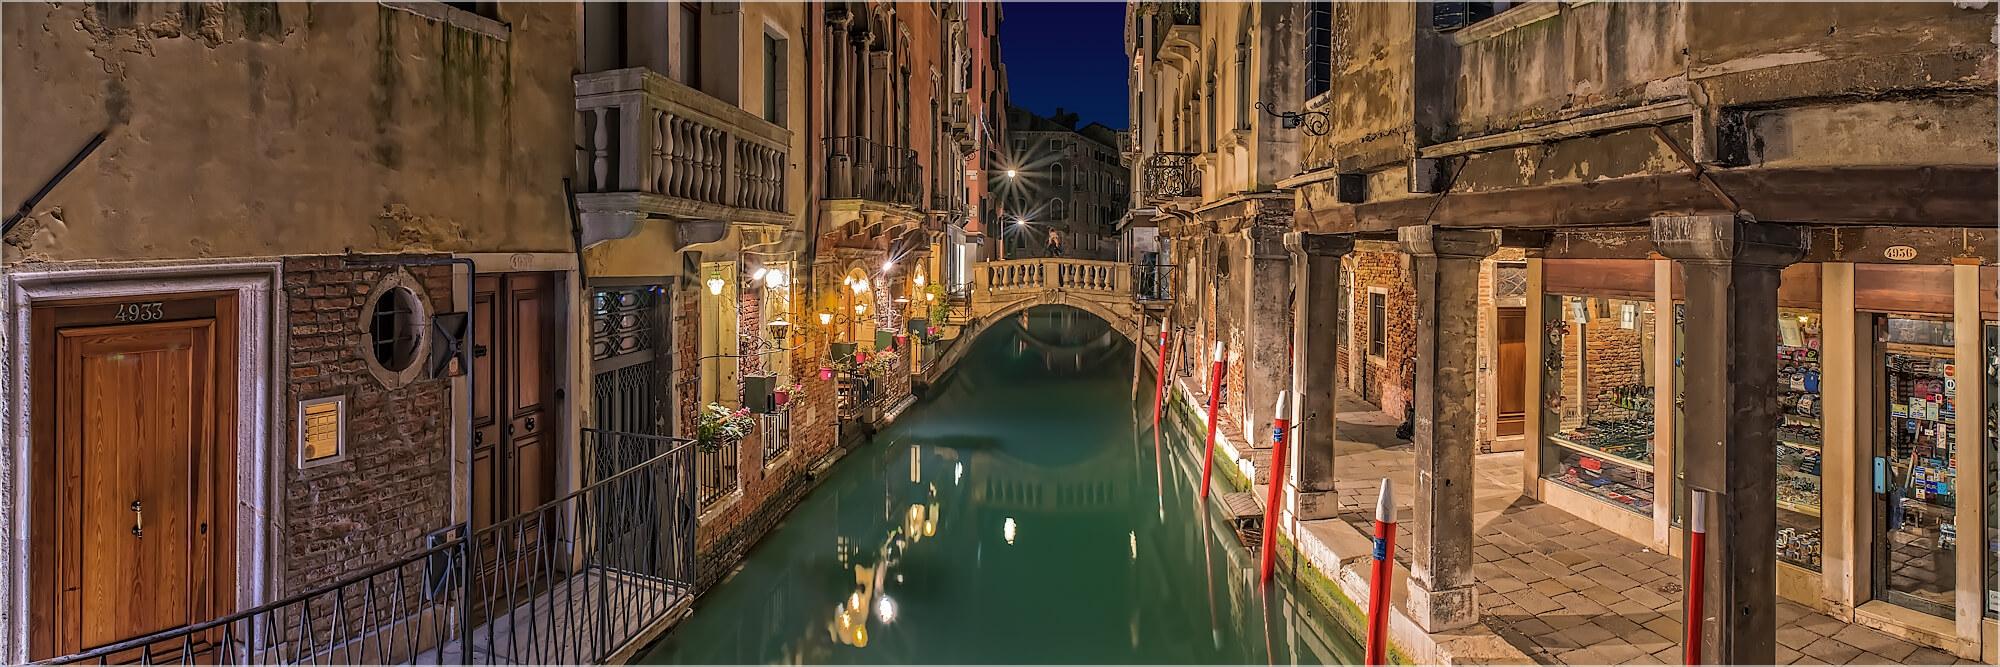 Panoramabild kleiner Kanal in Venedig Italien